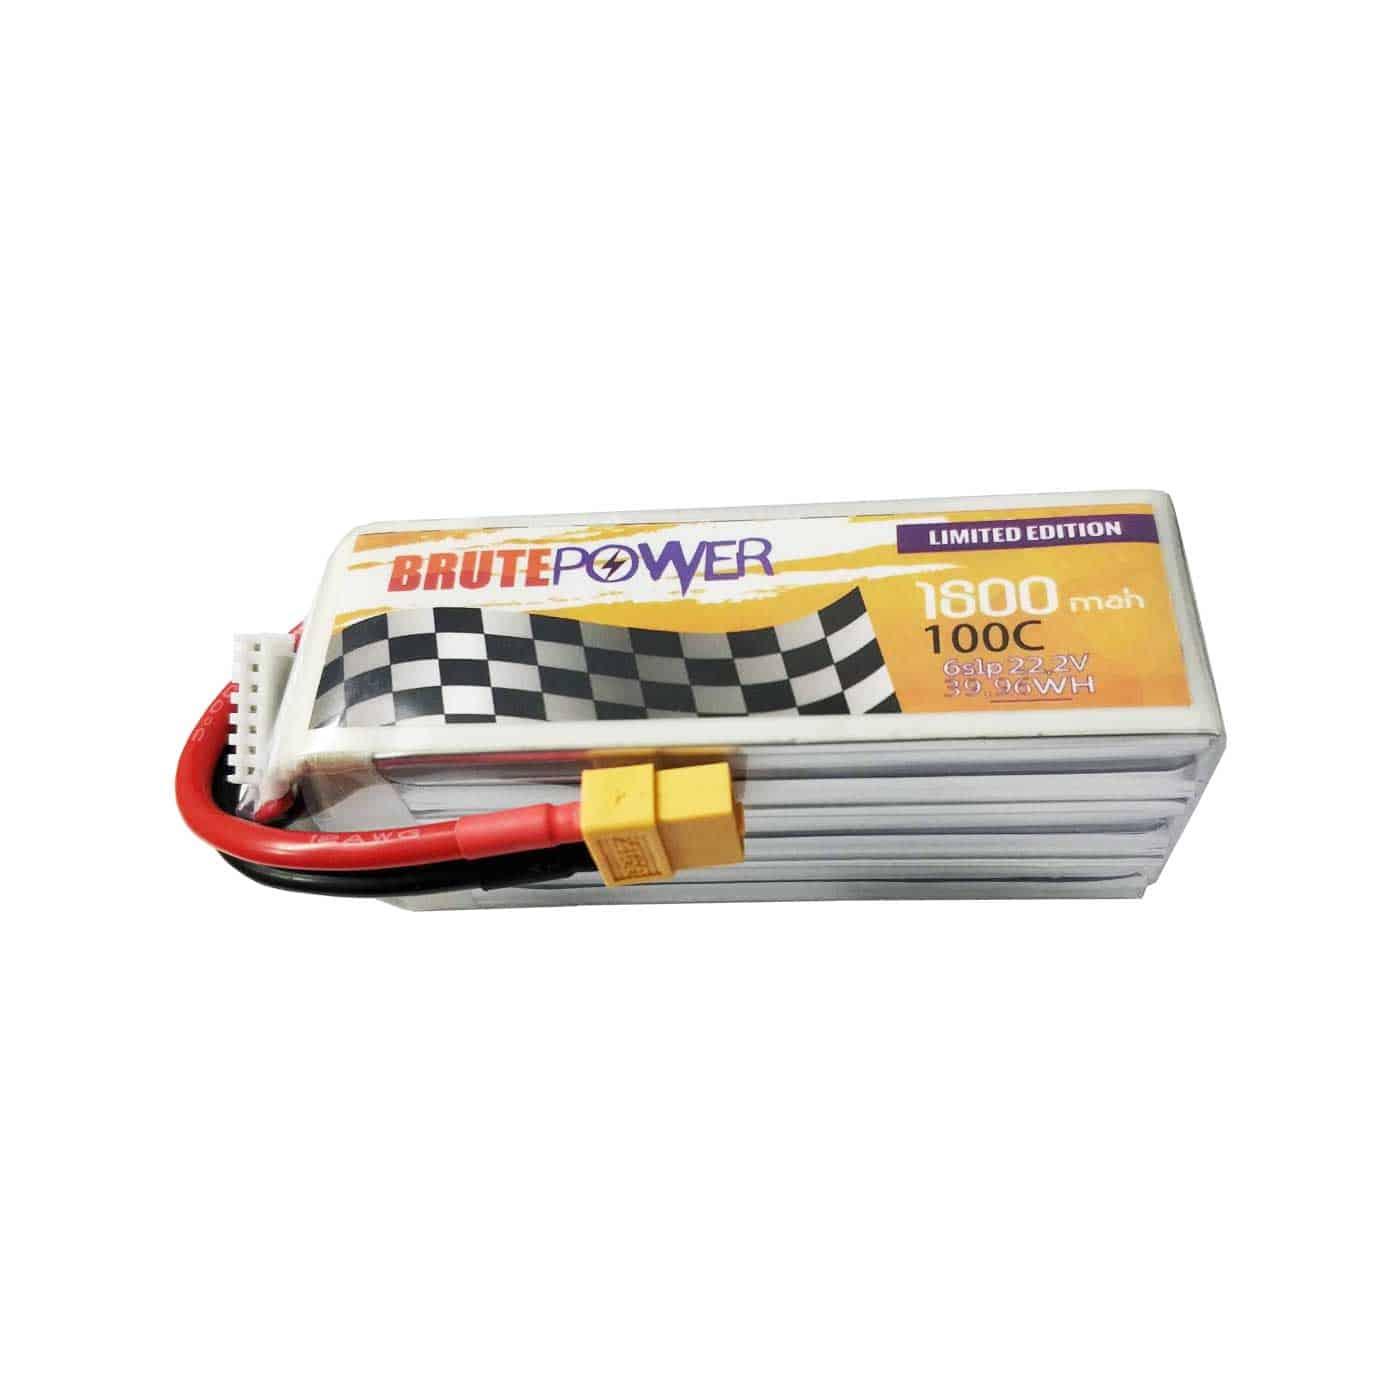 batería lipo brutepower 6s 1800mah 100c